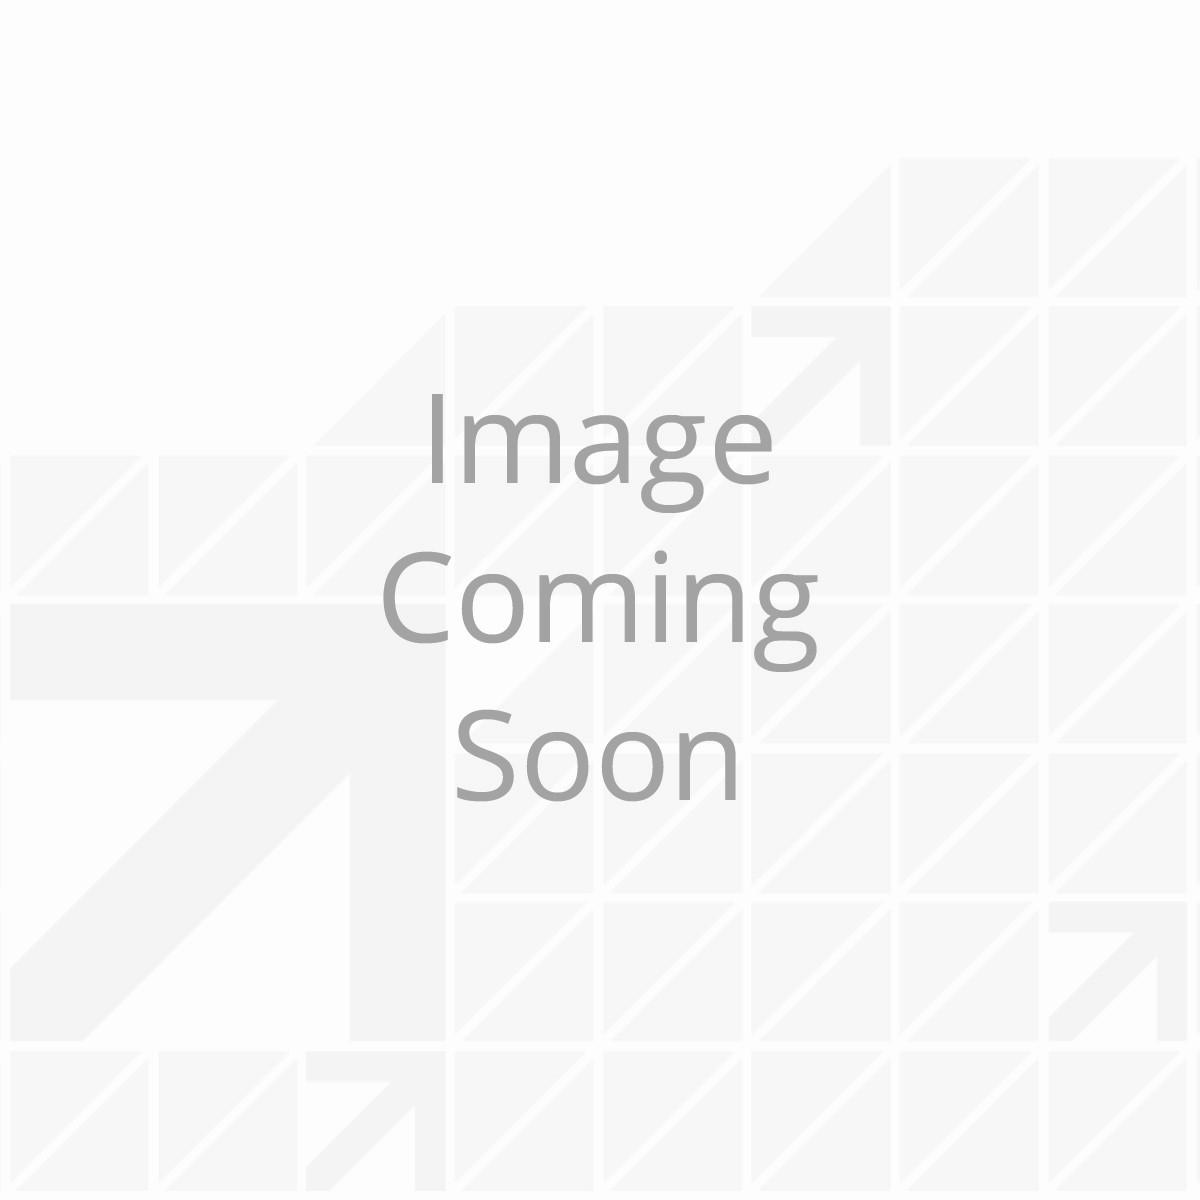 119216_-_tang_washer_-_001